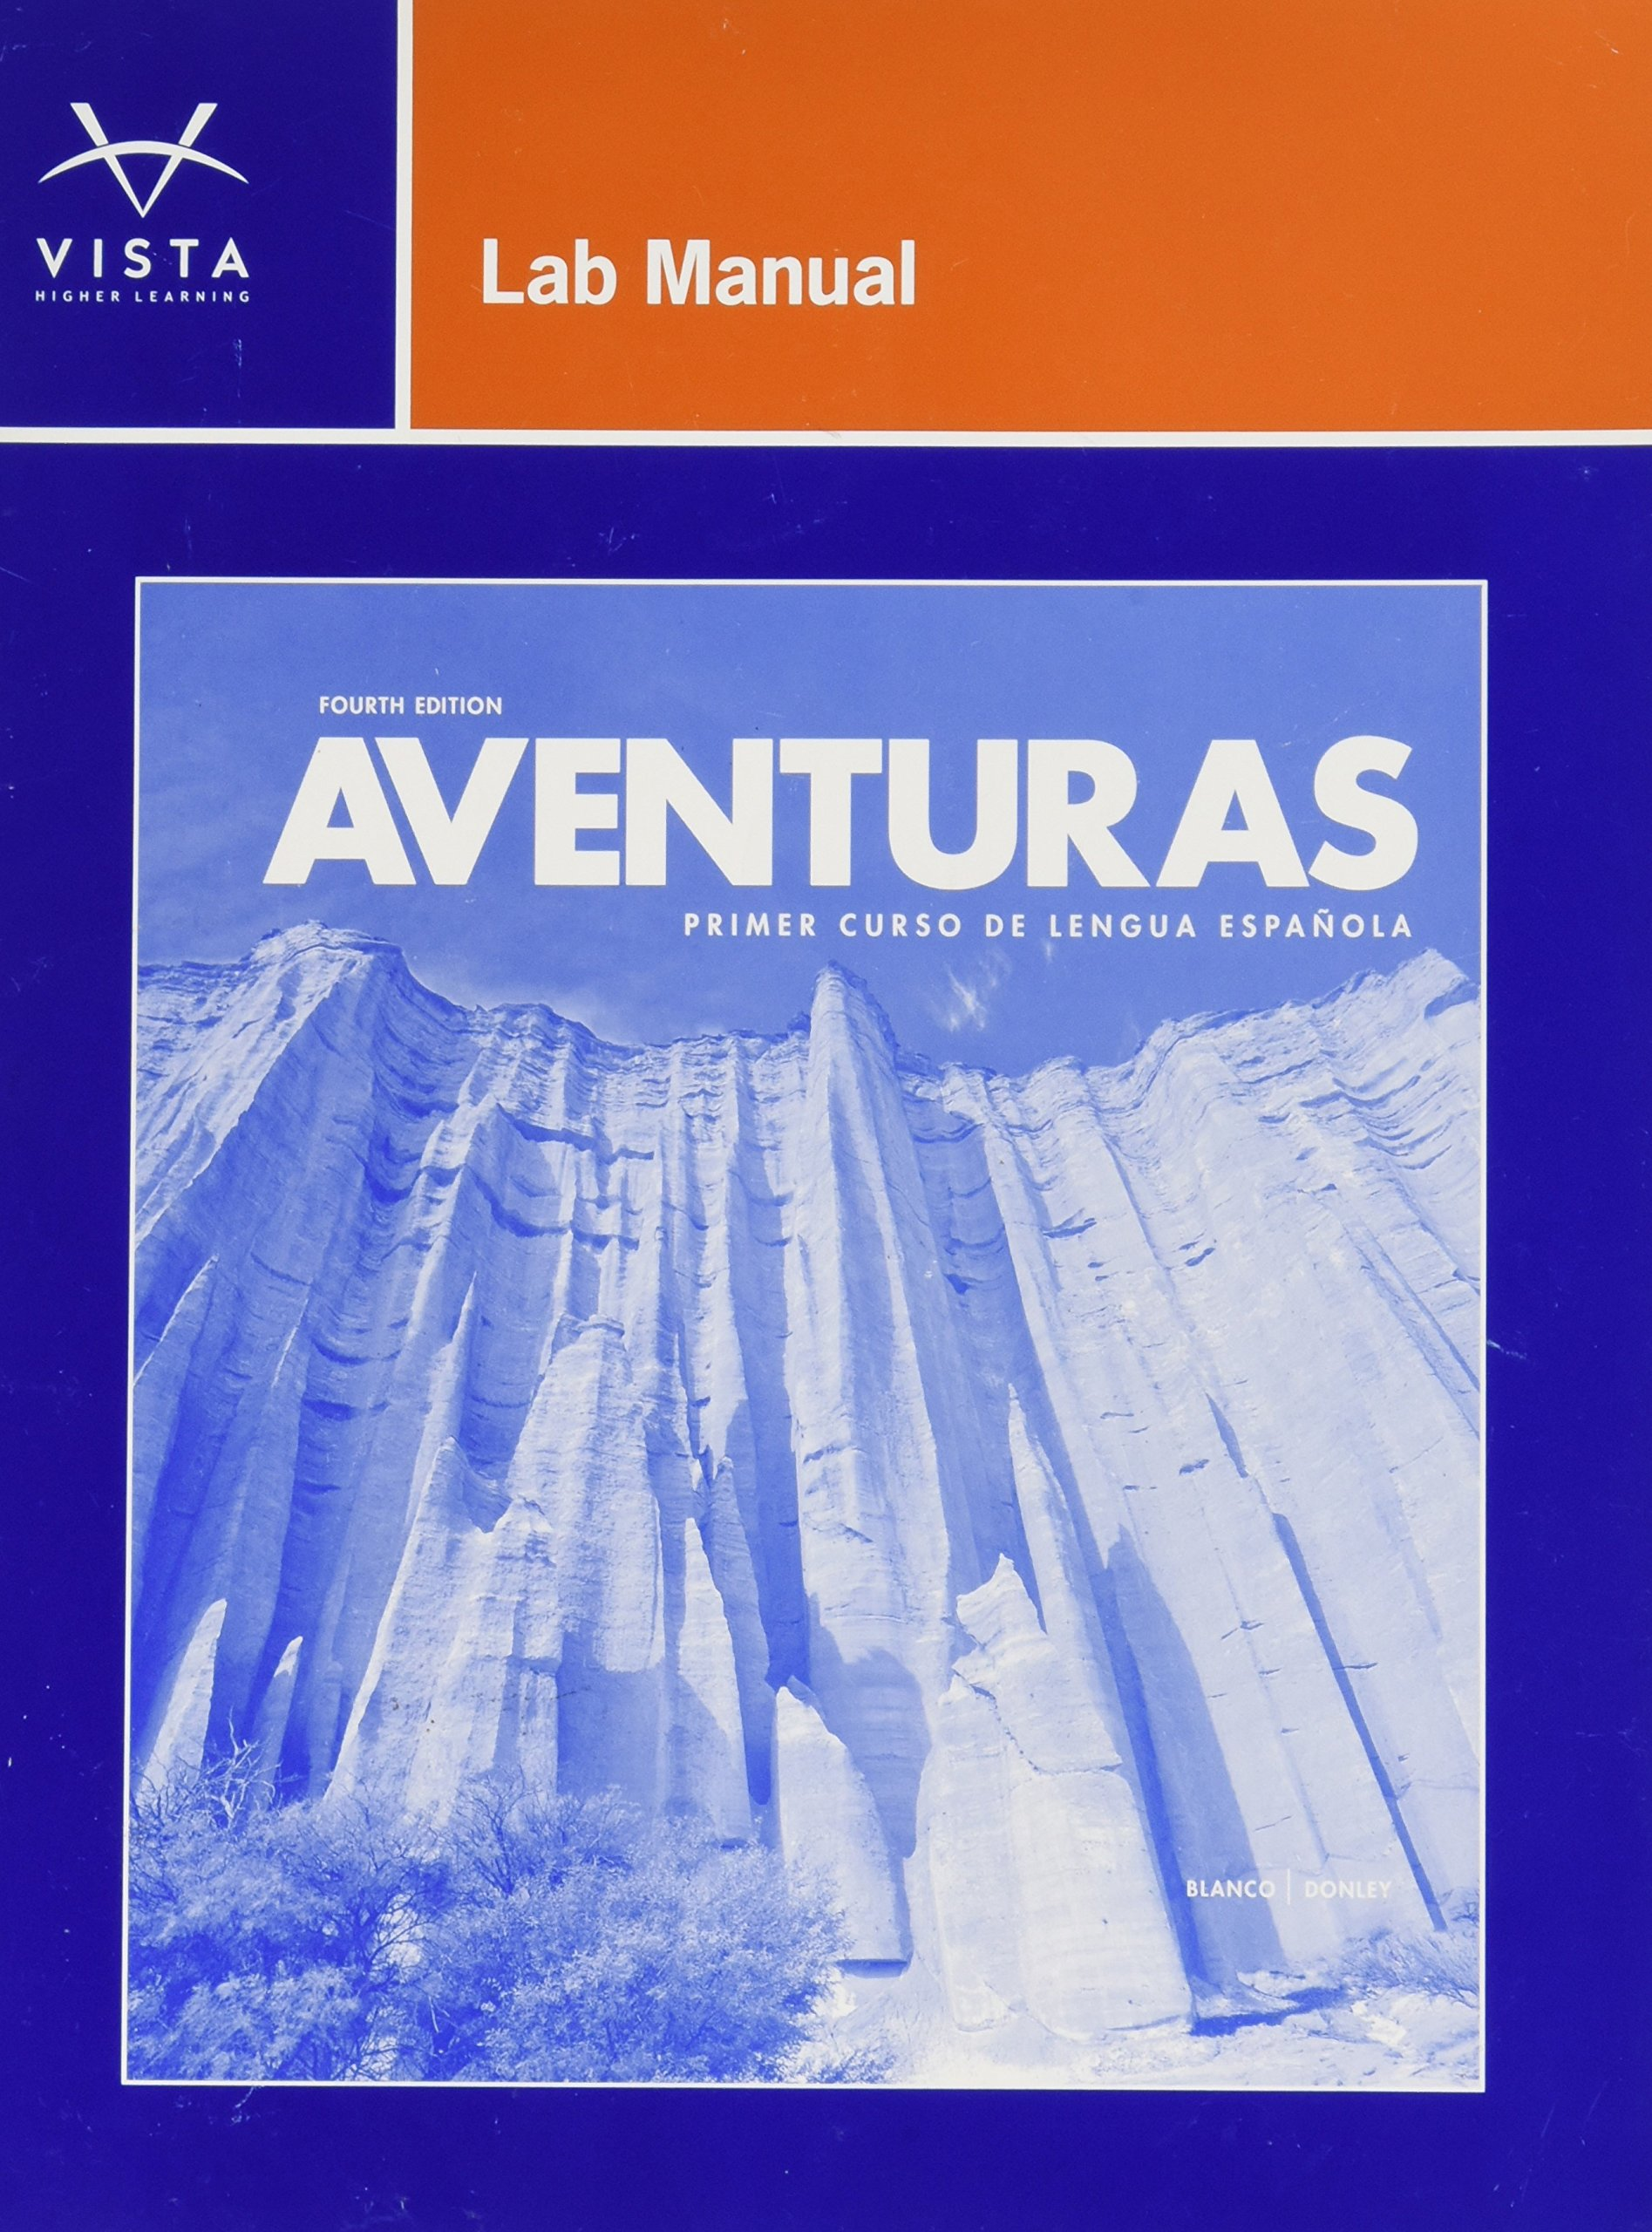 Aventuras labn vista higher learning 9781618570574 amazon aventuras labn vista higher learning 9781618570574 amazon books fandeluxe Gallery